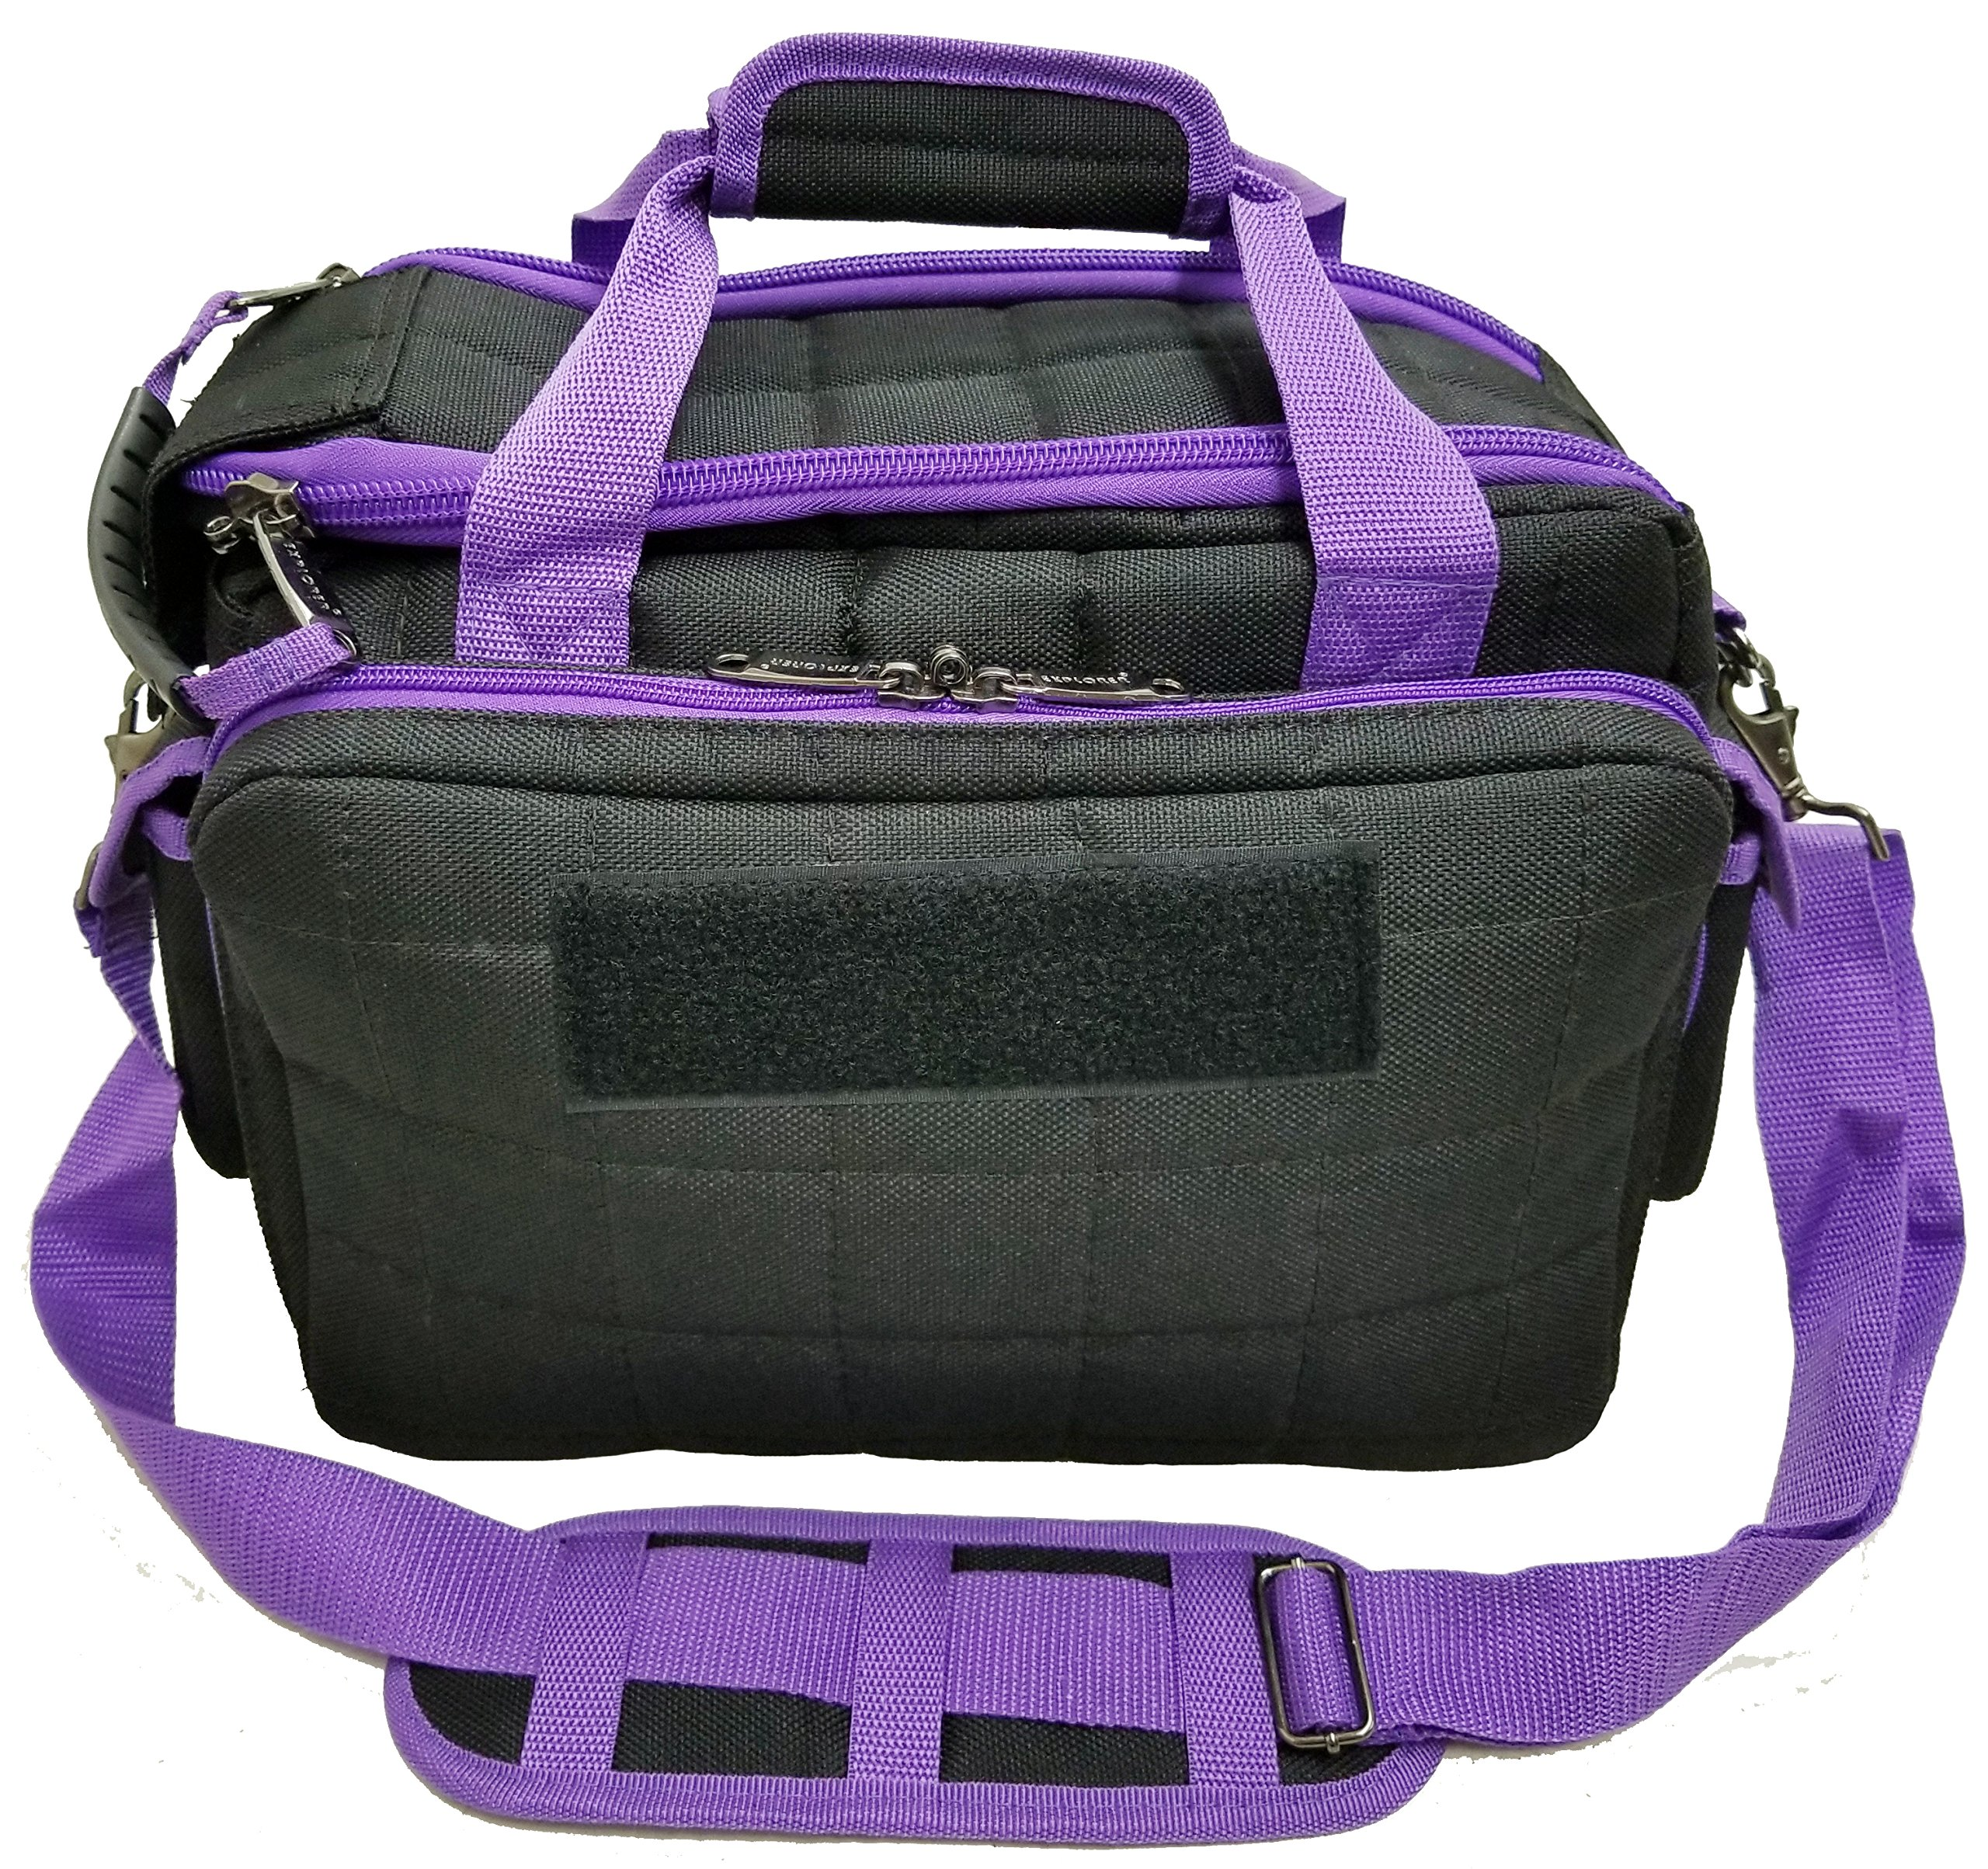 Explorere 8 Pistol Tactical Range Go Bag Assault Gear Range Bag Hiking Shoulder Strap EDC Camera Bag MOLLE Modular Deployment Compact Utility Military Surplus Gear by Explorer